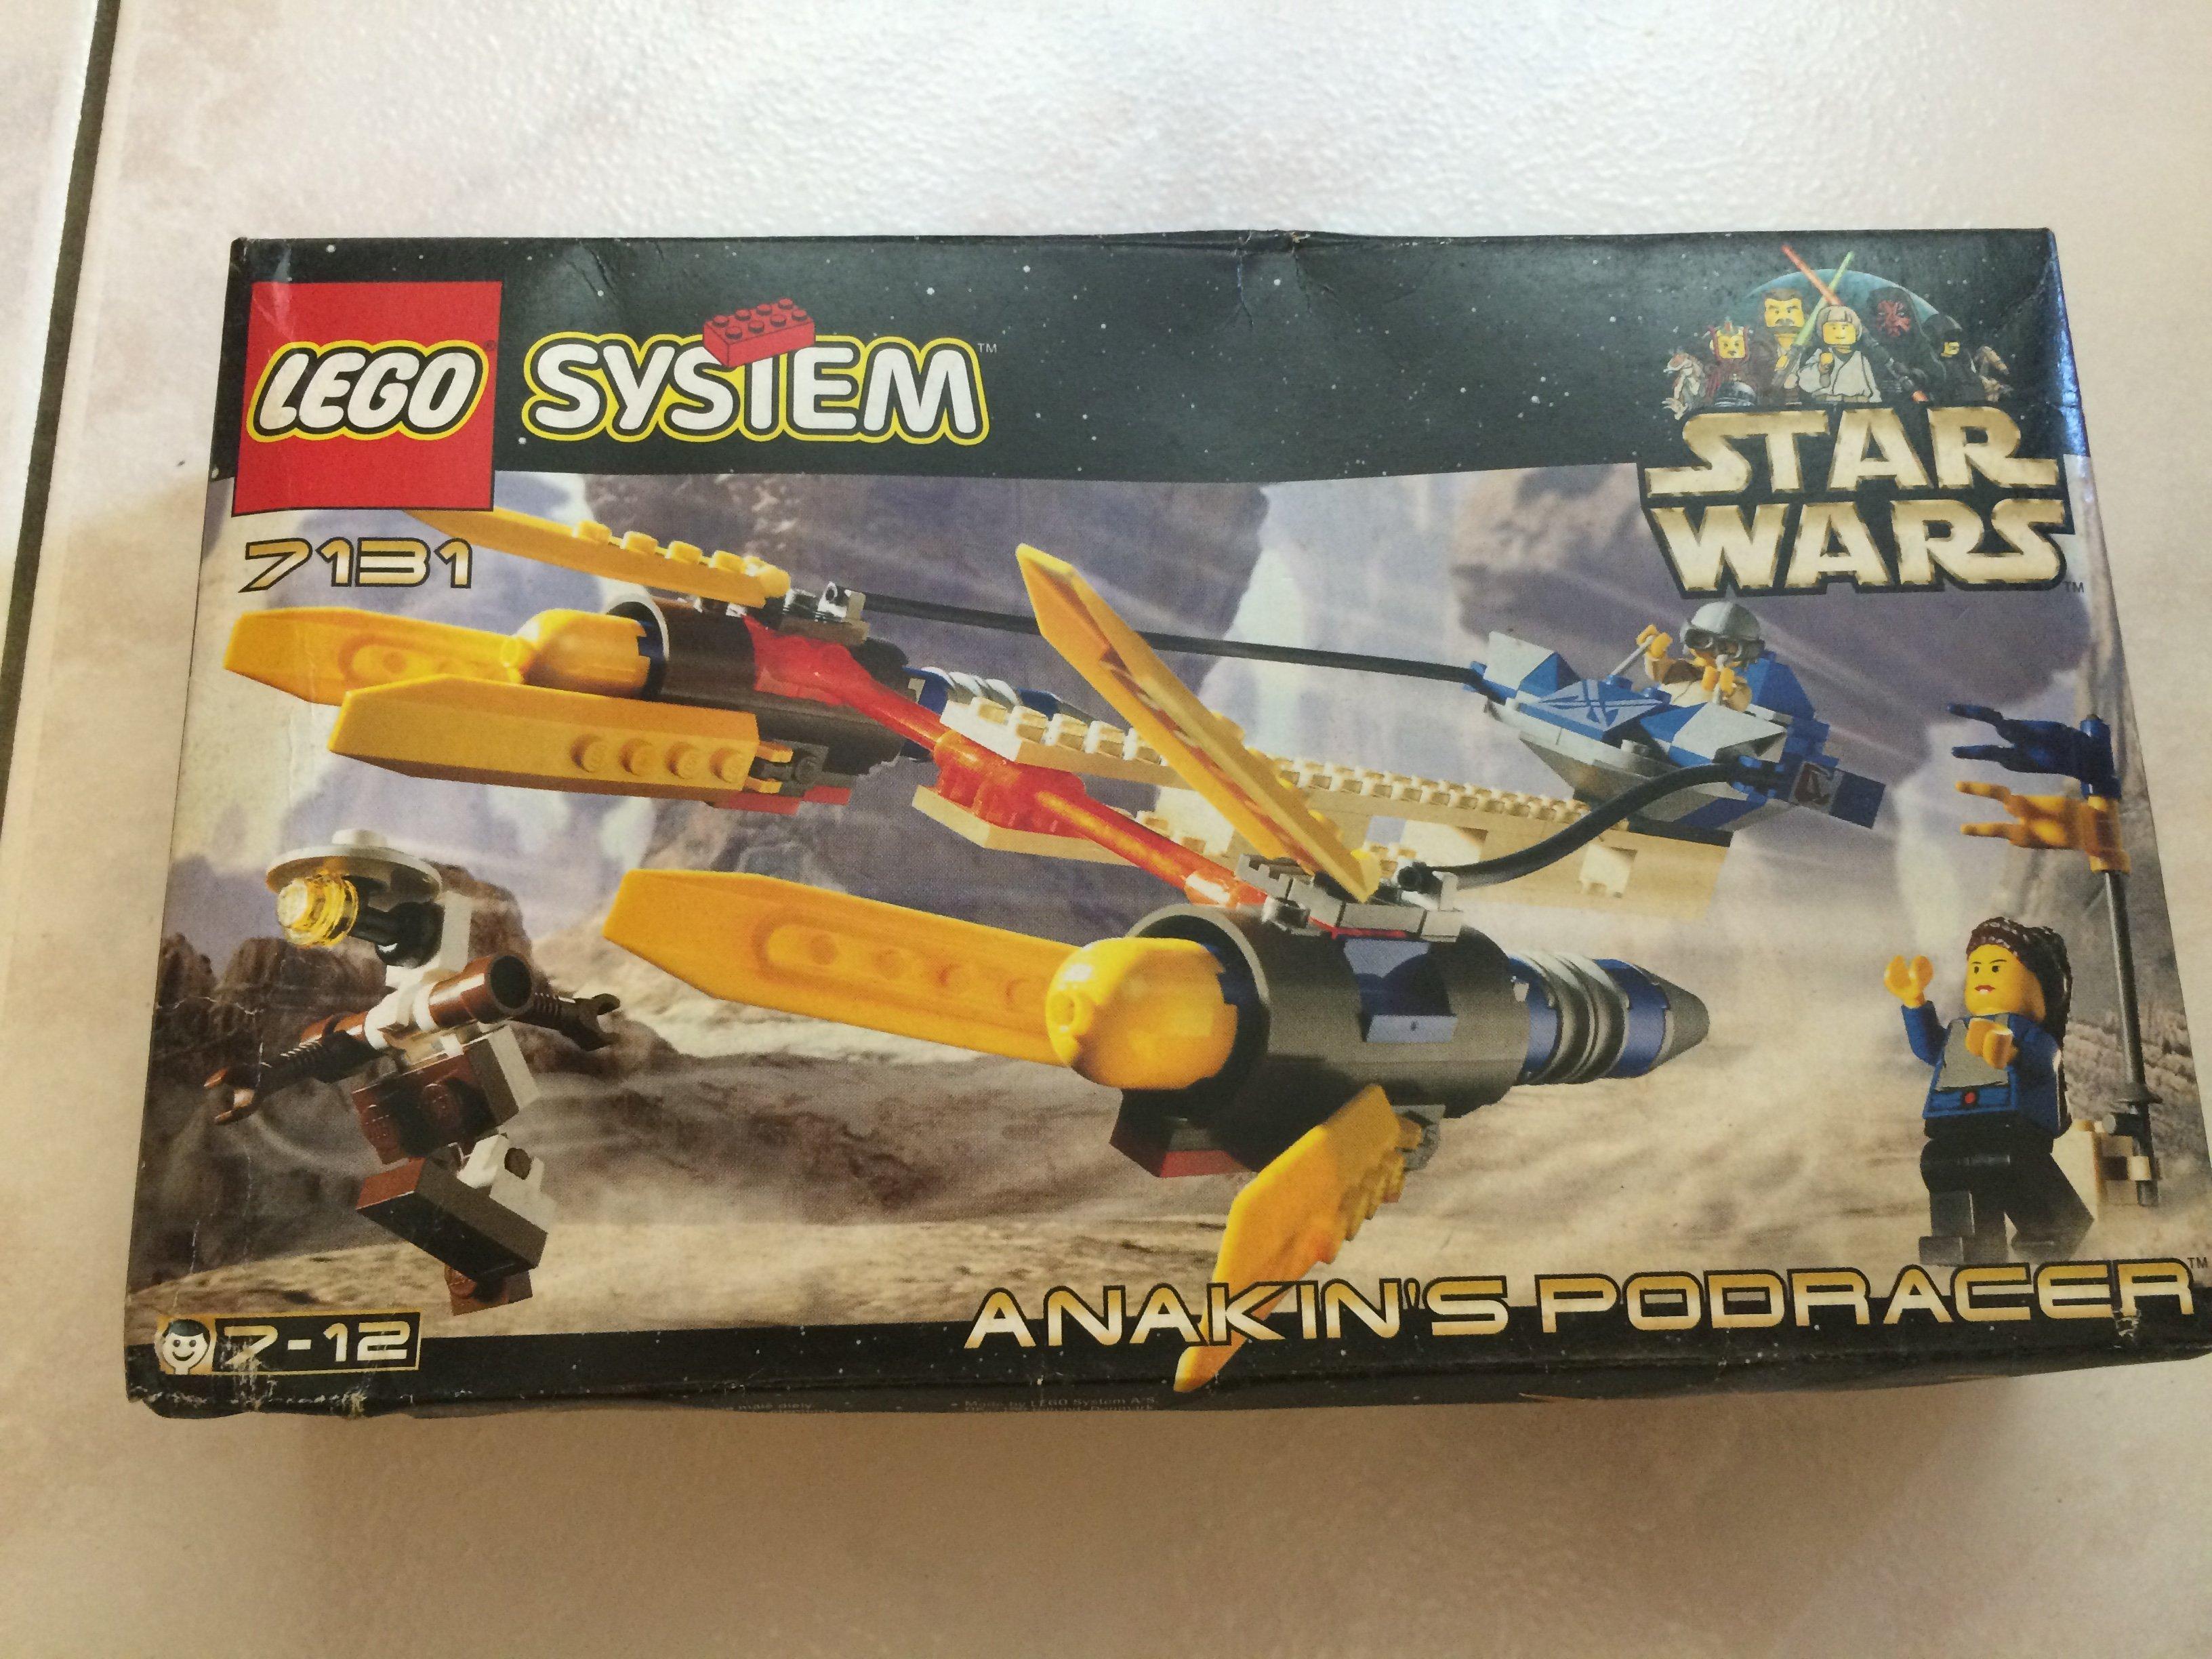 絕版 Lego 樂高 星際大戰 7131 Anakins Podracer 全新